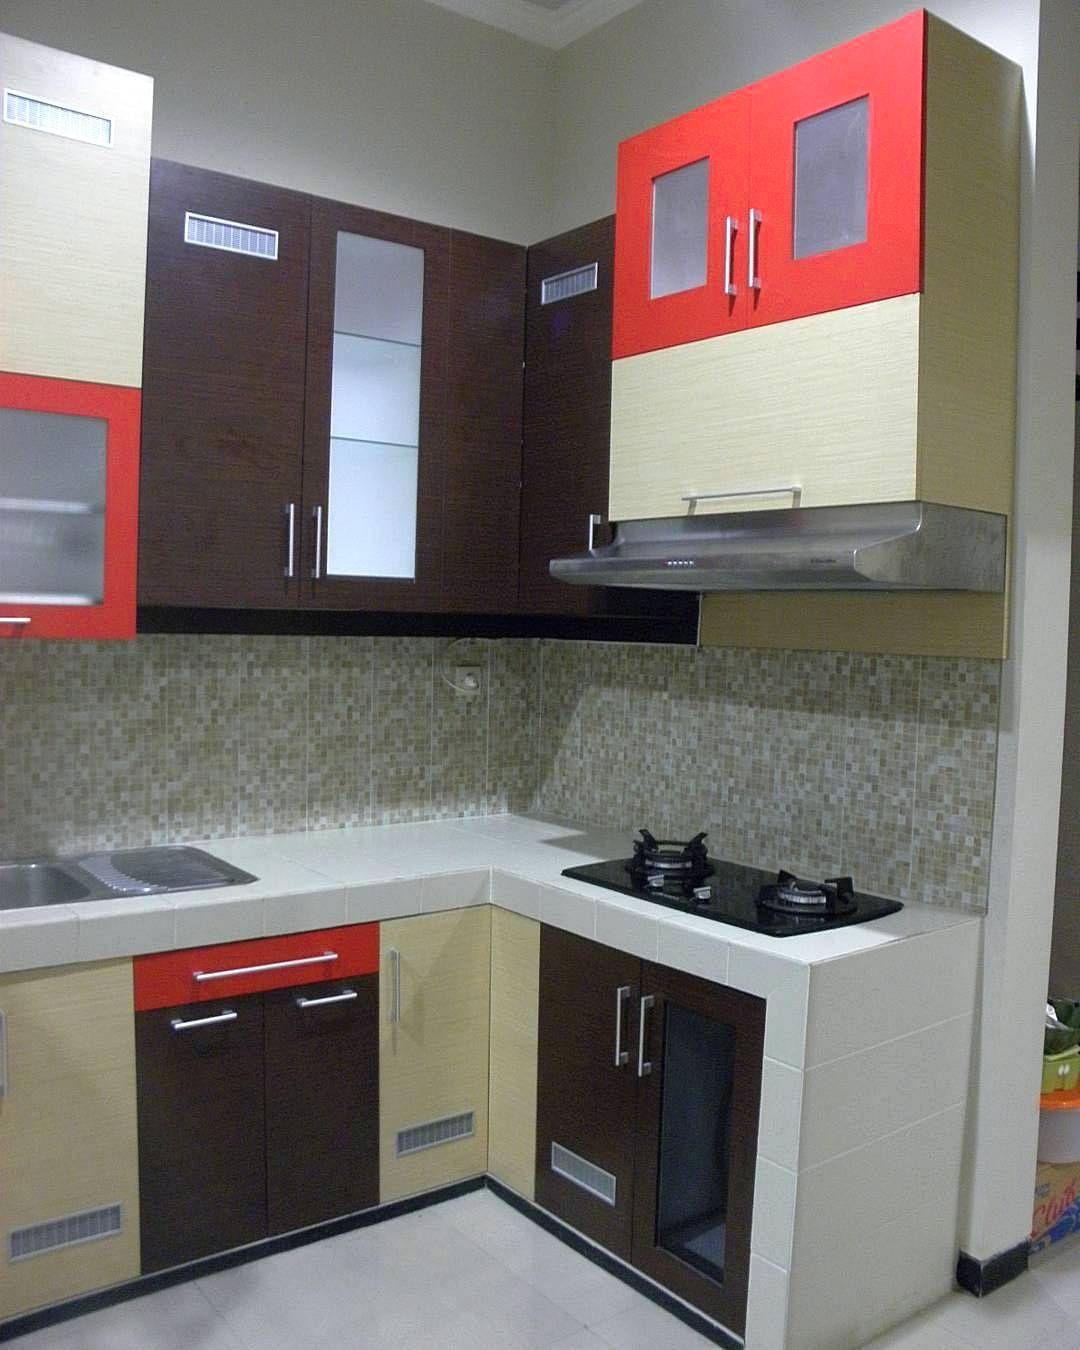 Design Kitchen Set Untuk Dapur Kecil desain kitchen set sederhana | dapur minimalis idaman | pinterest